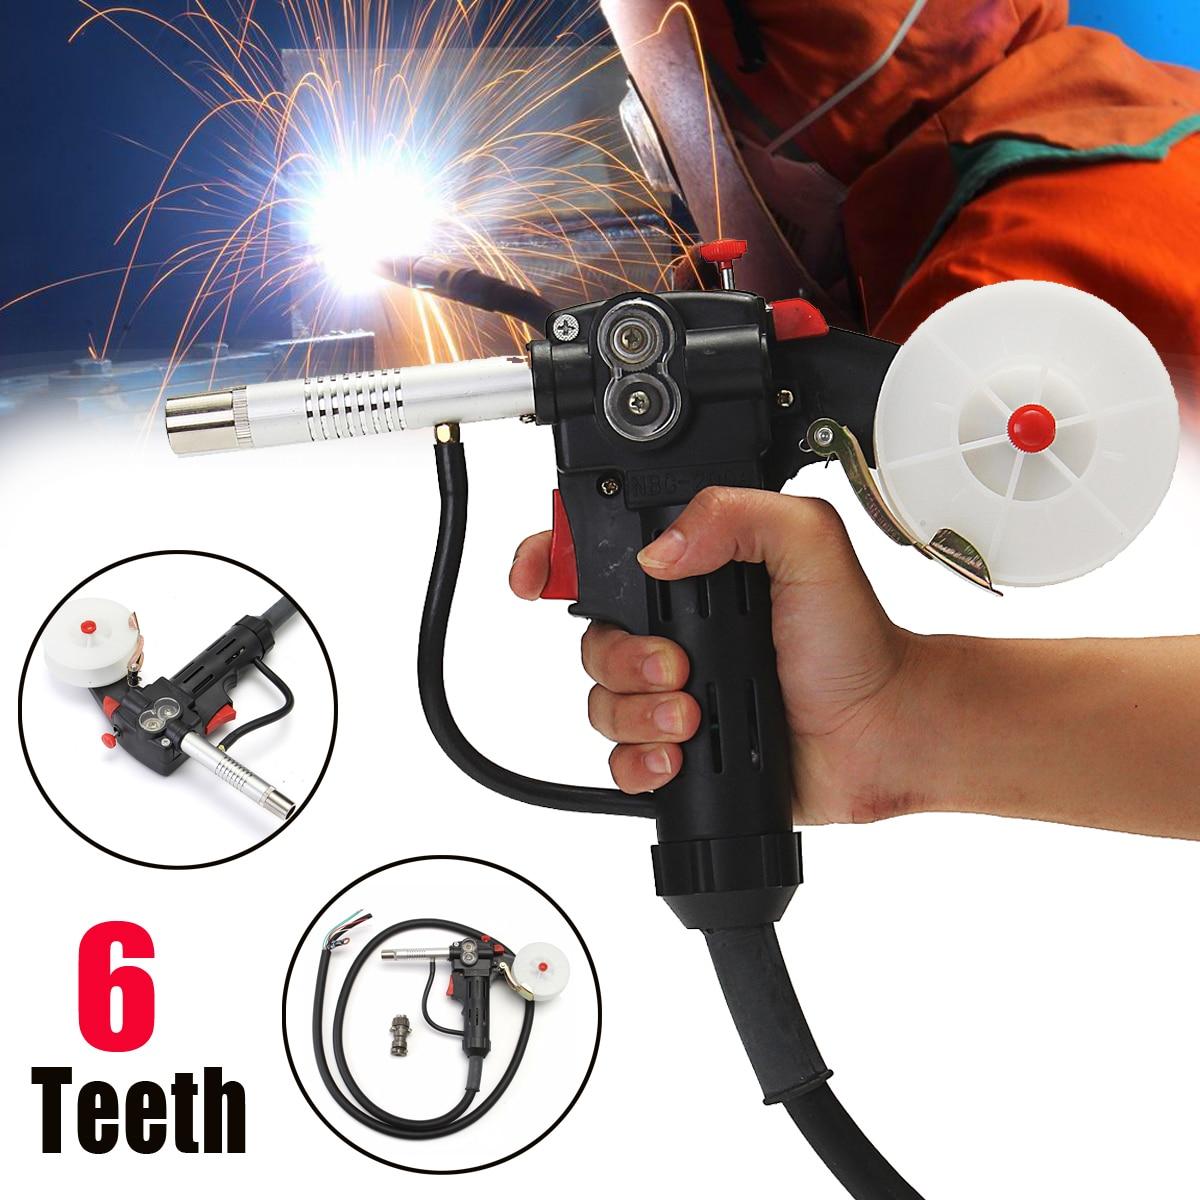 6 Feet MIG Welding Spool Gun Push Pull Feeder Aluminum Steel Welding Torch +2m Wire Cable